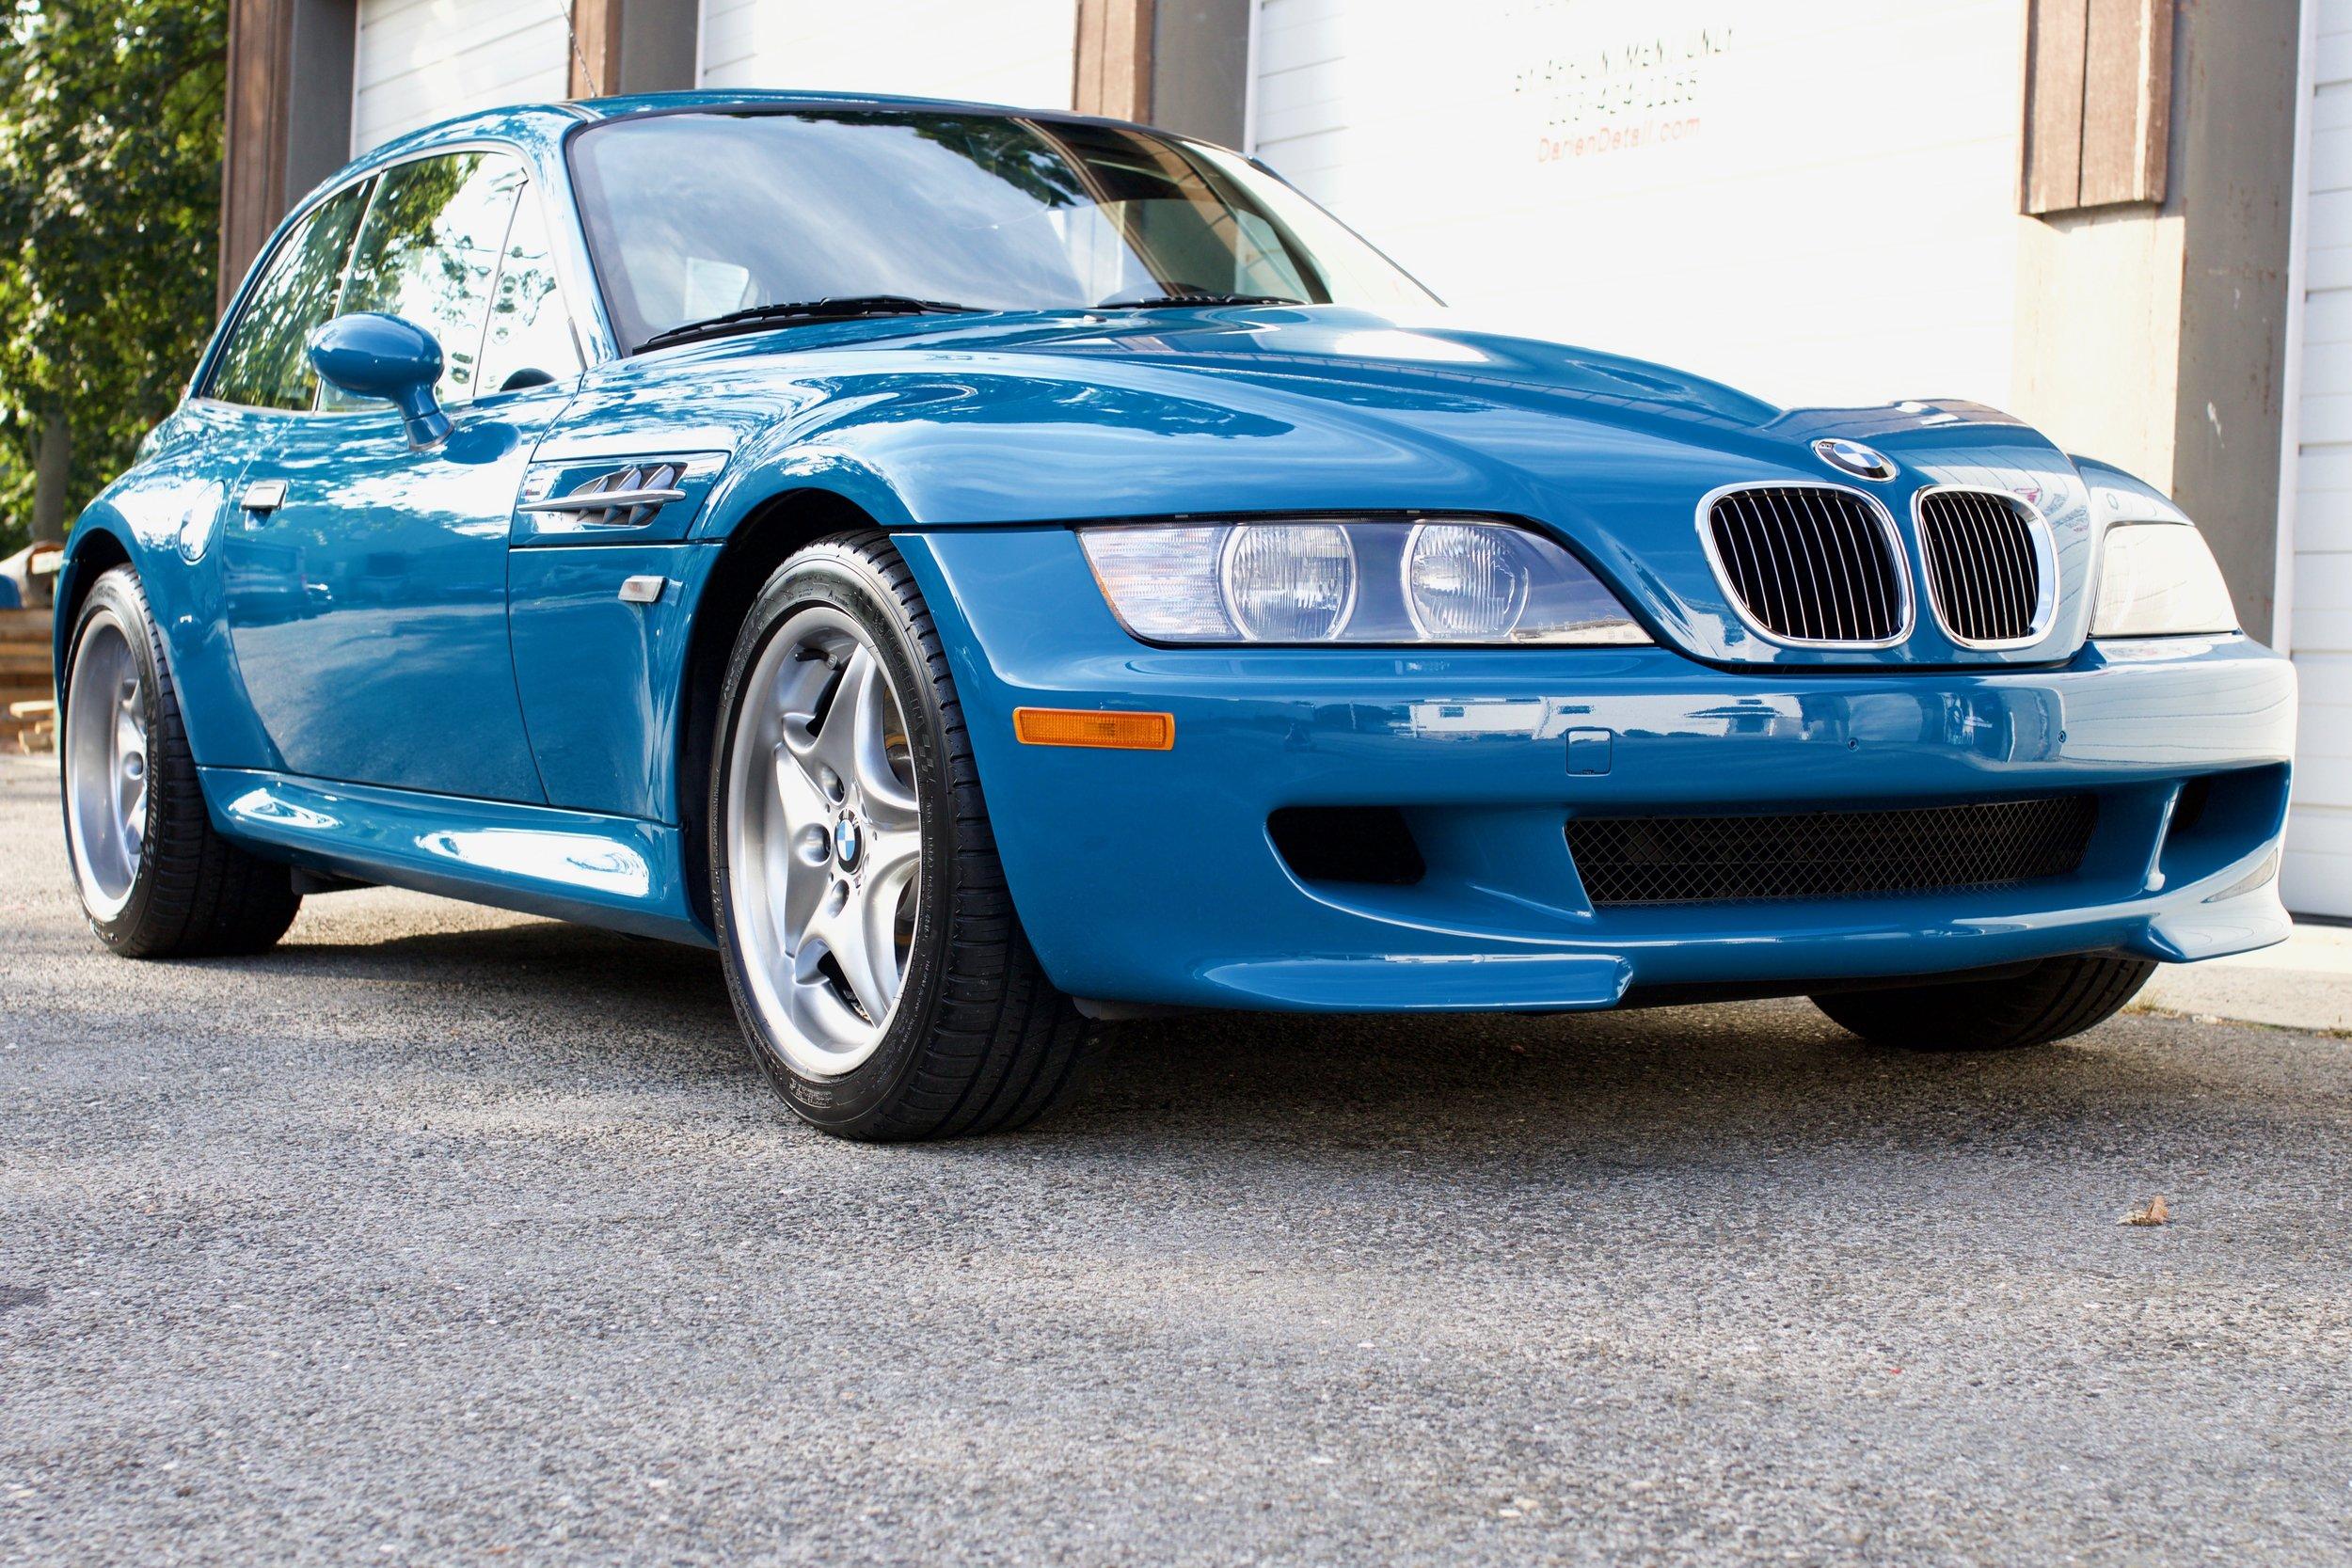 BMW M Coupe - Paint Protection Film - Paint Correction